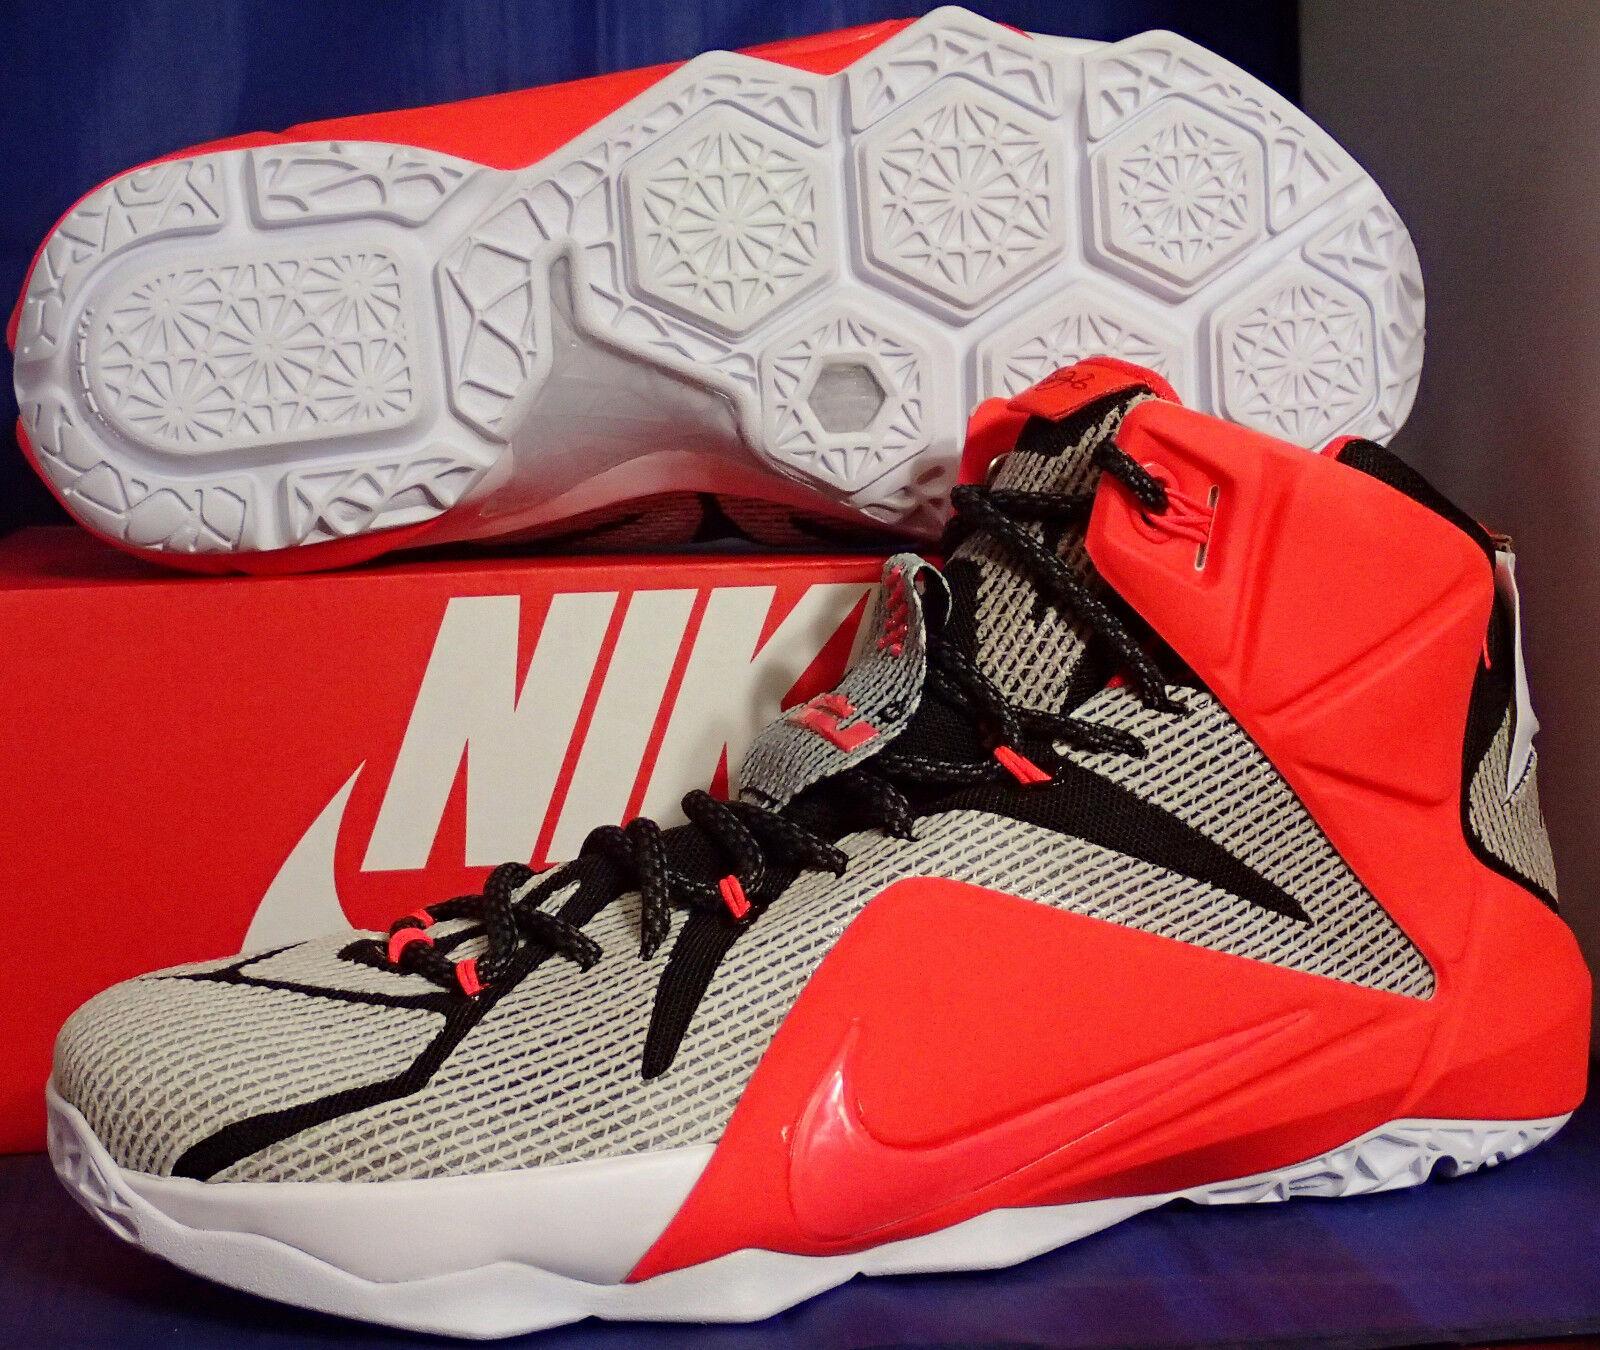 Nike Lebron XII 12 iD White Bright Crimson Black SZ 10.5 ( 728709-994 )